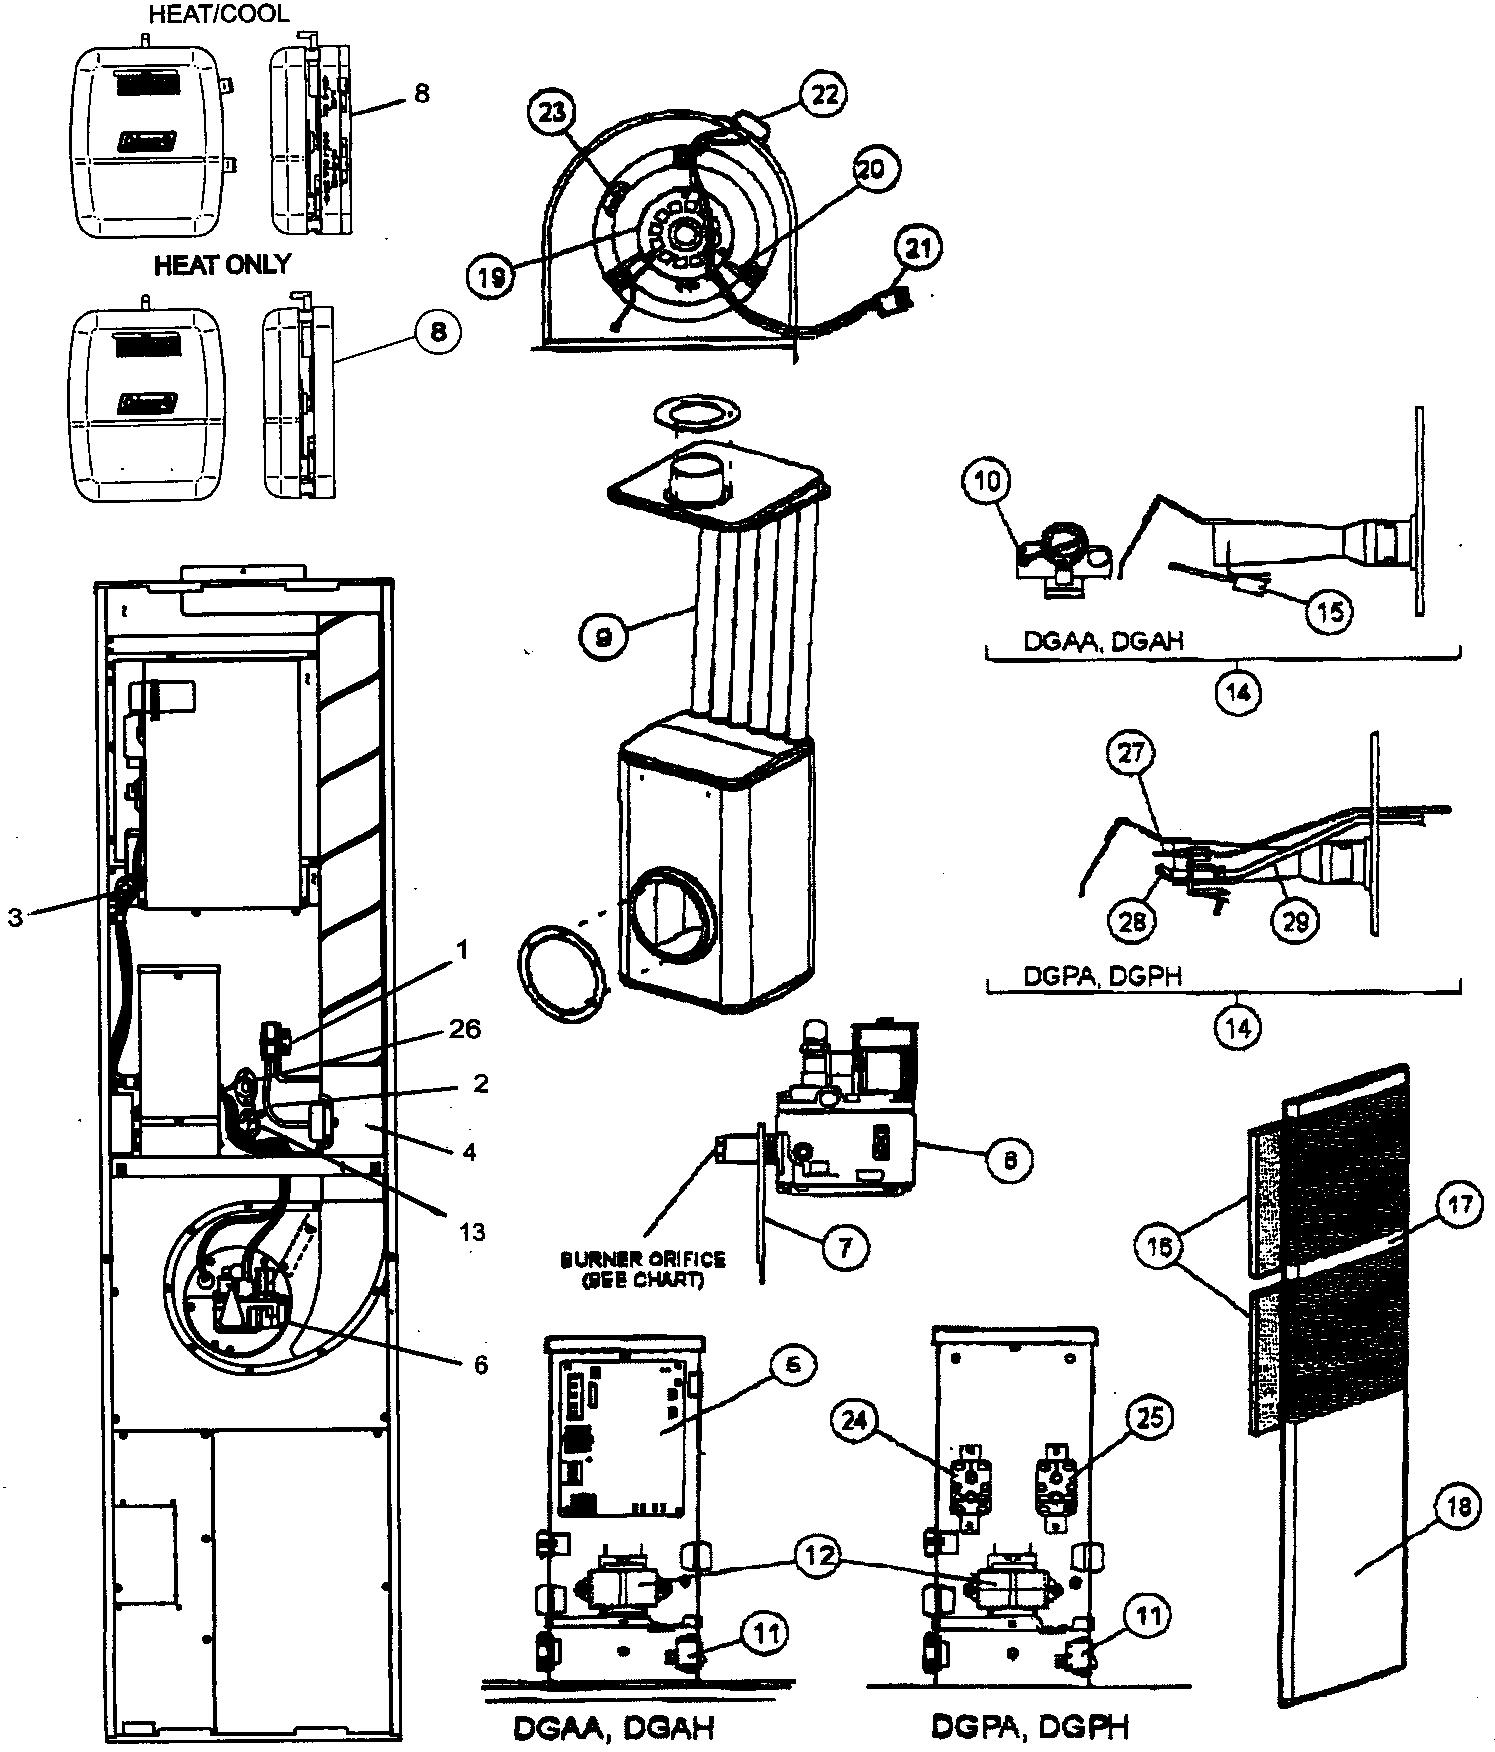 medium resolution of coleman furnace schematics wiring diagram mega coleman furnace schematics